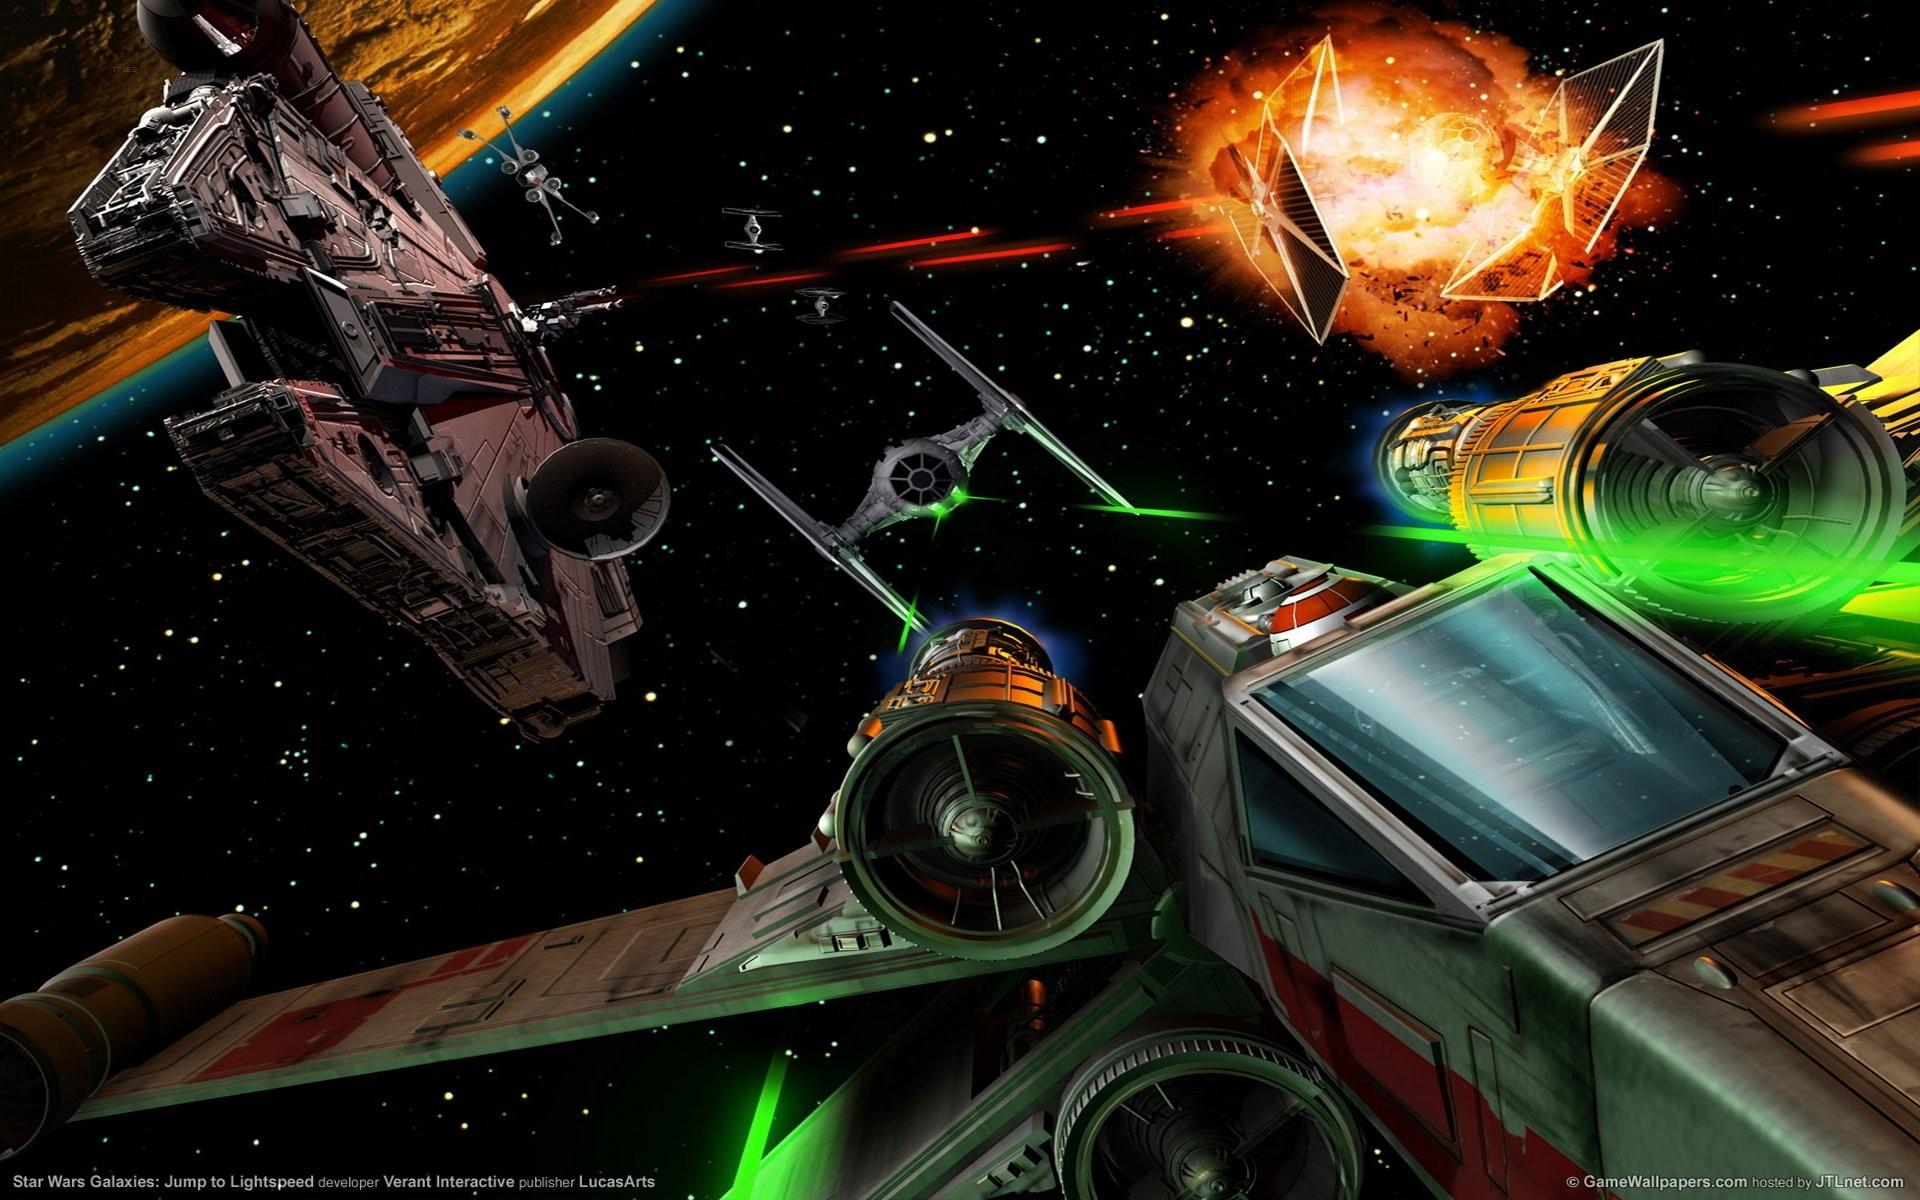 Space Battle Wallpaper 67 Images